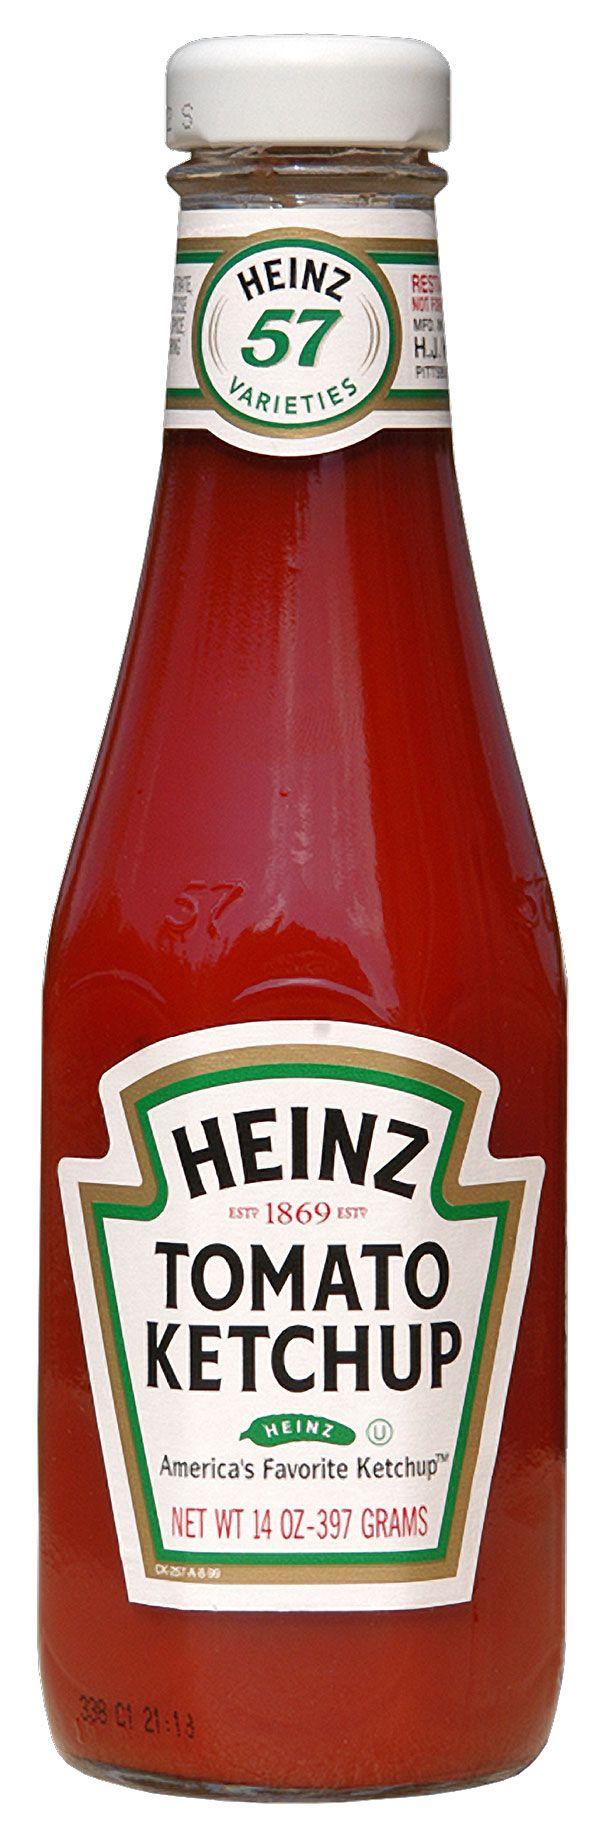 Pittsburgh.: Bbq Sauces Recipe Mirianfdq, Bbq Sauce Recipe Mirianfdq, Honey Bbq, Pittsburgh, Burgh Things, Sauce Recipes, Food, Glasses Bottle, Heinz Ketchup